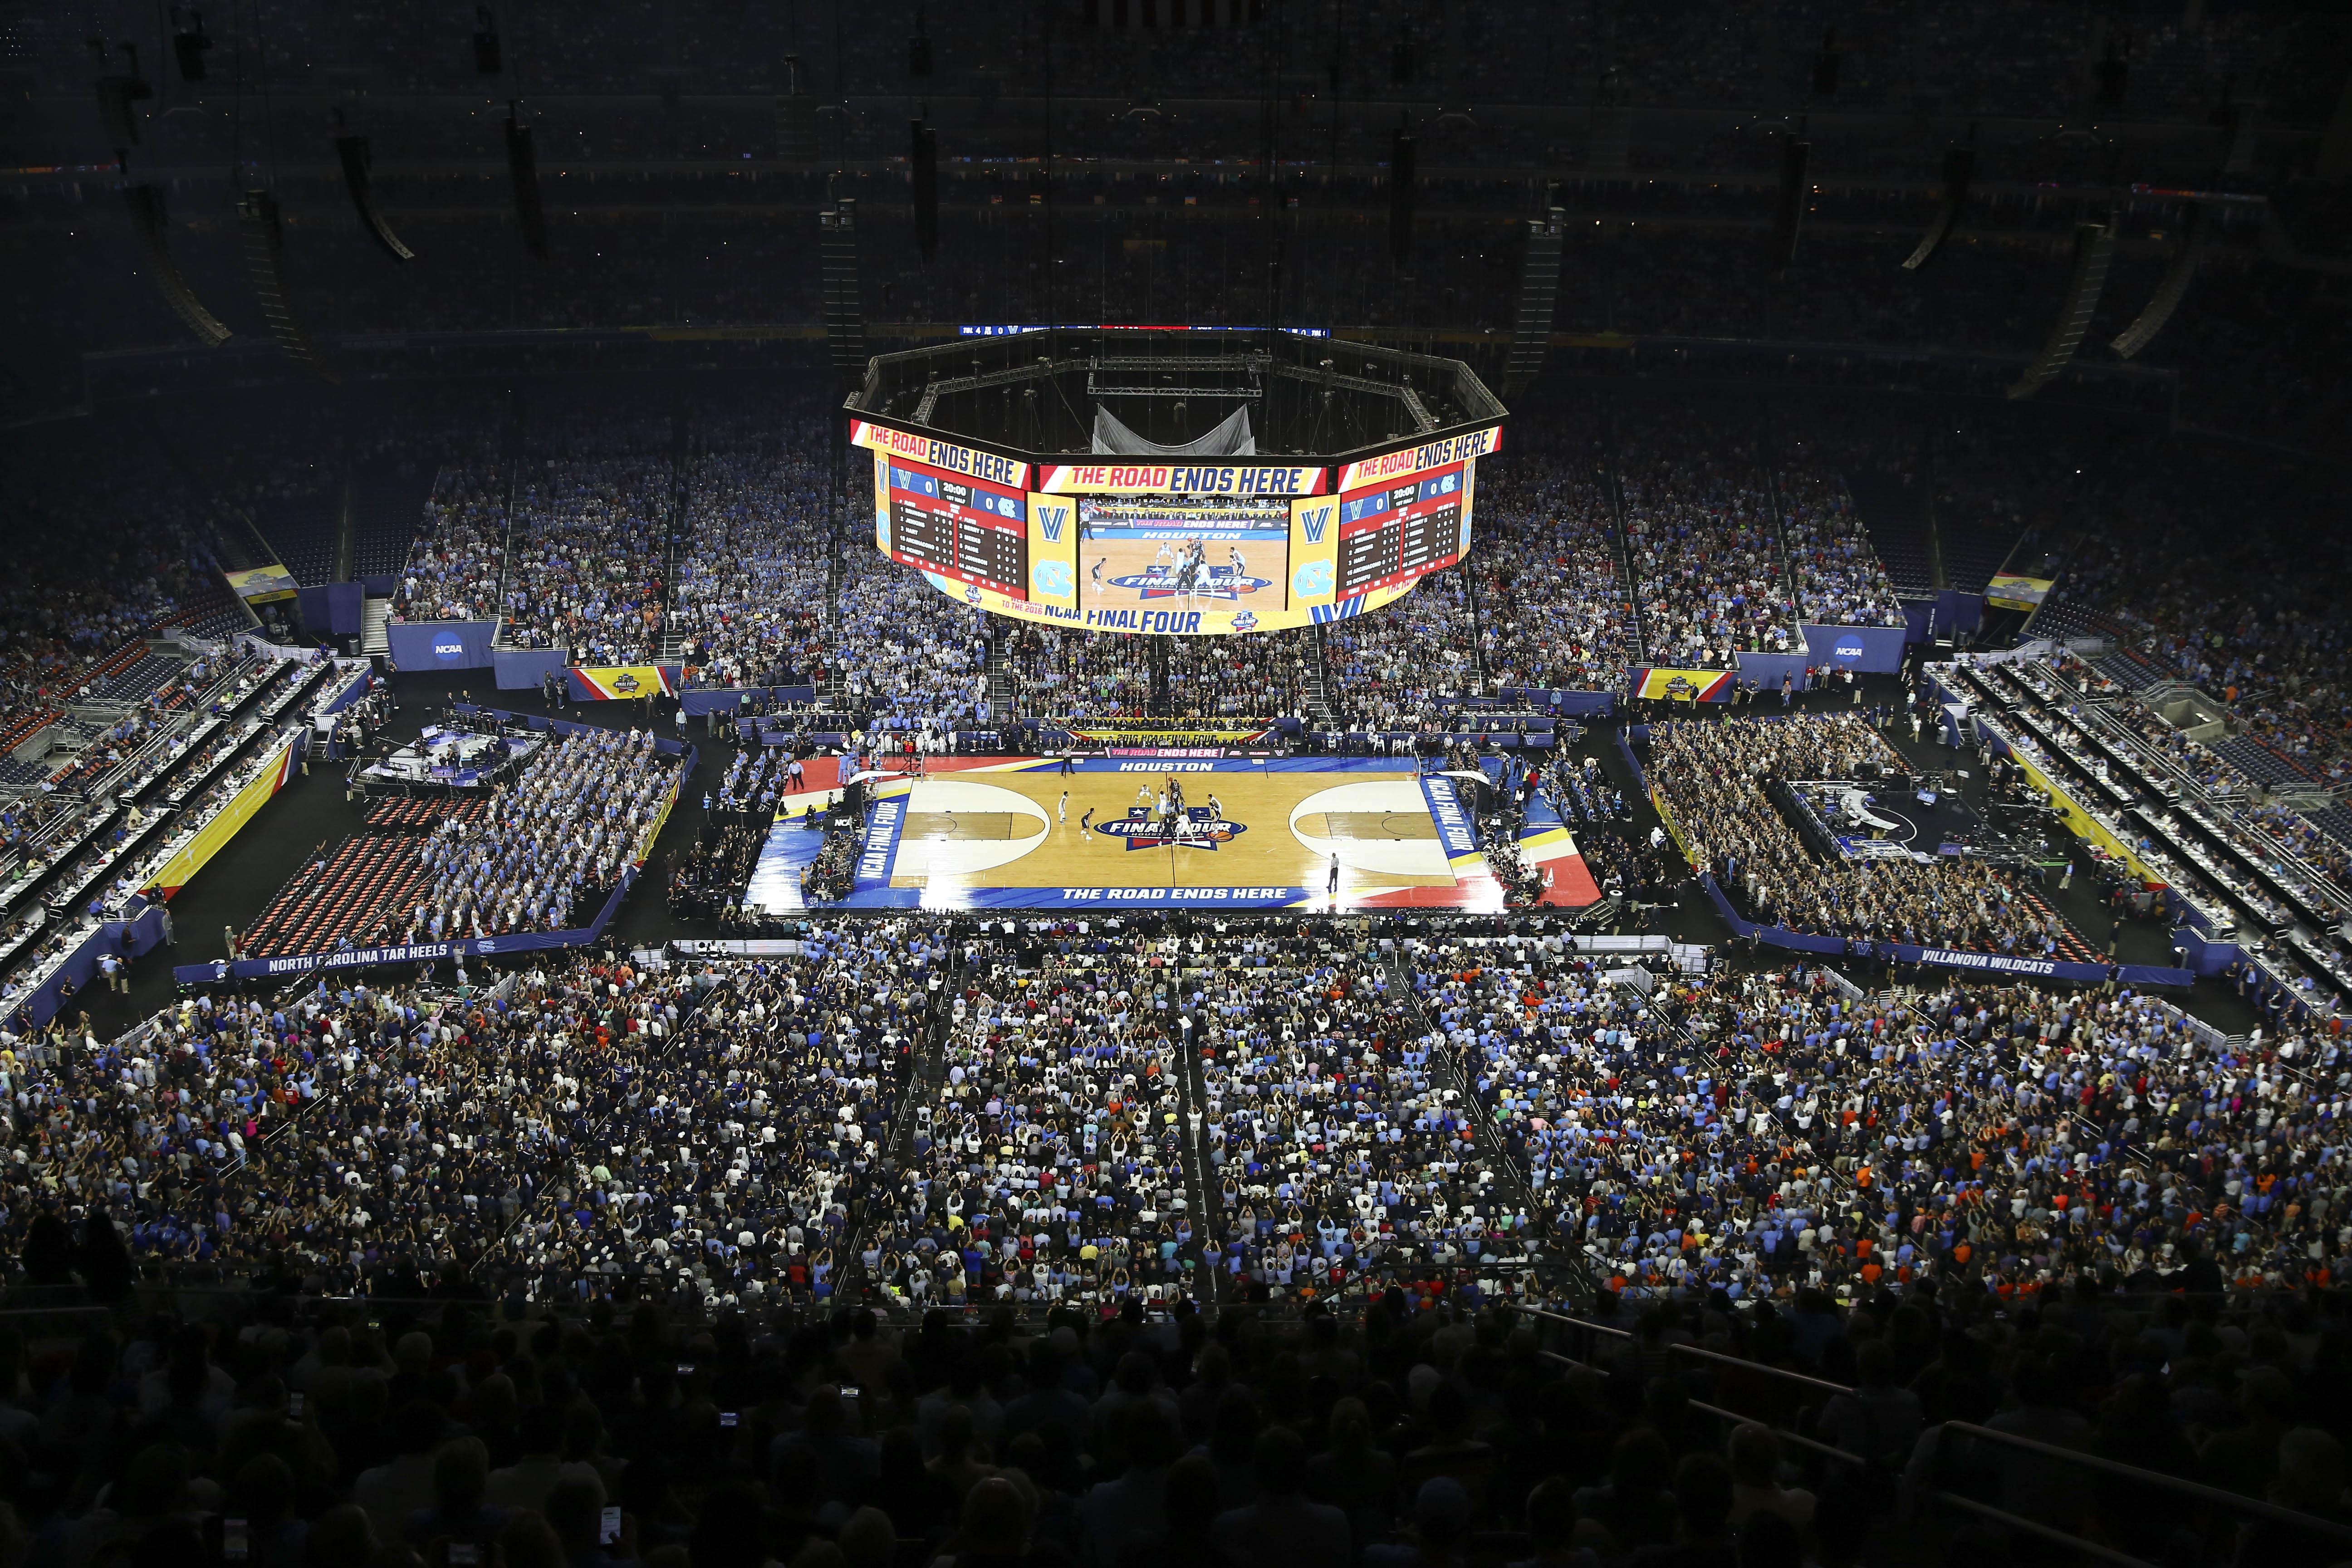 ncaa basketball championship line bet live online